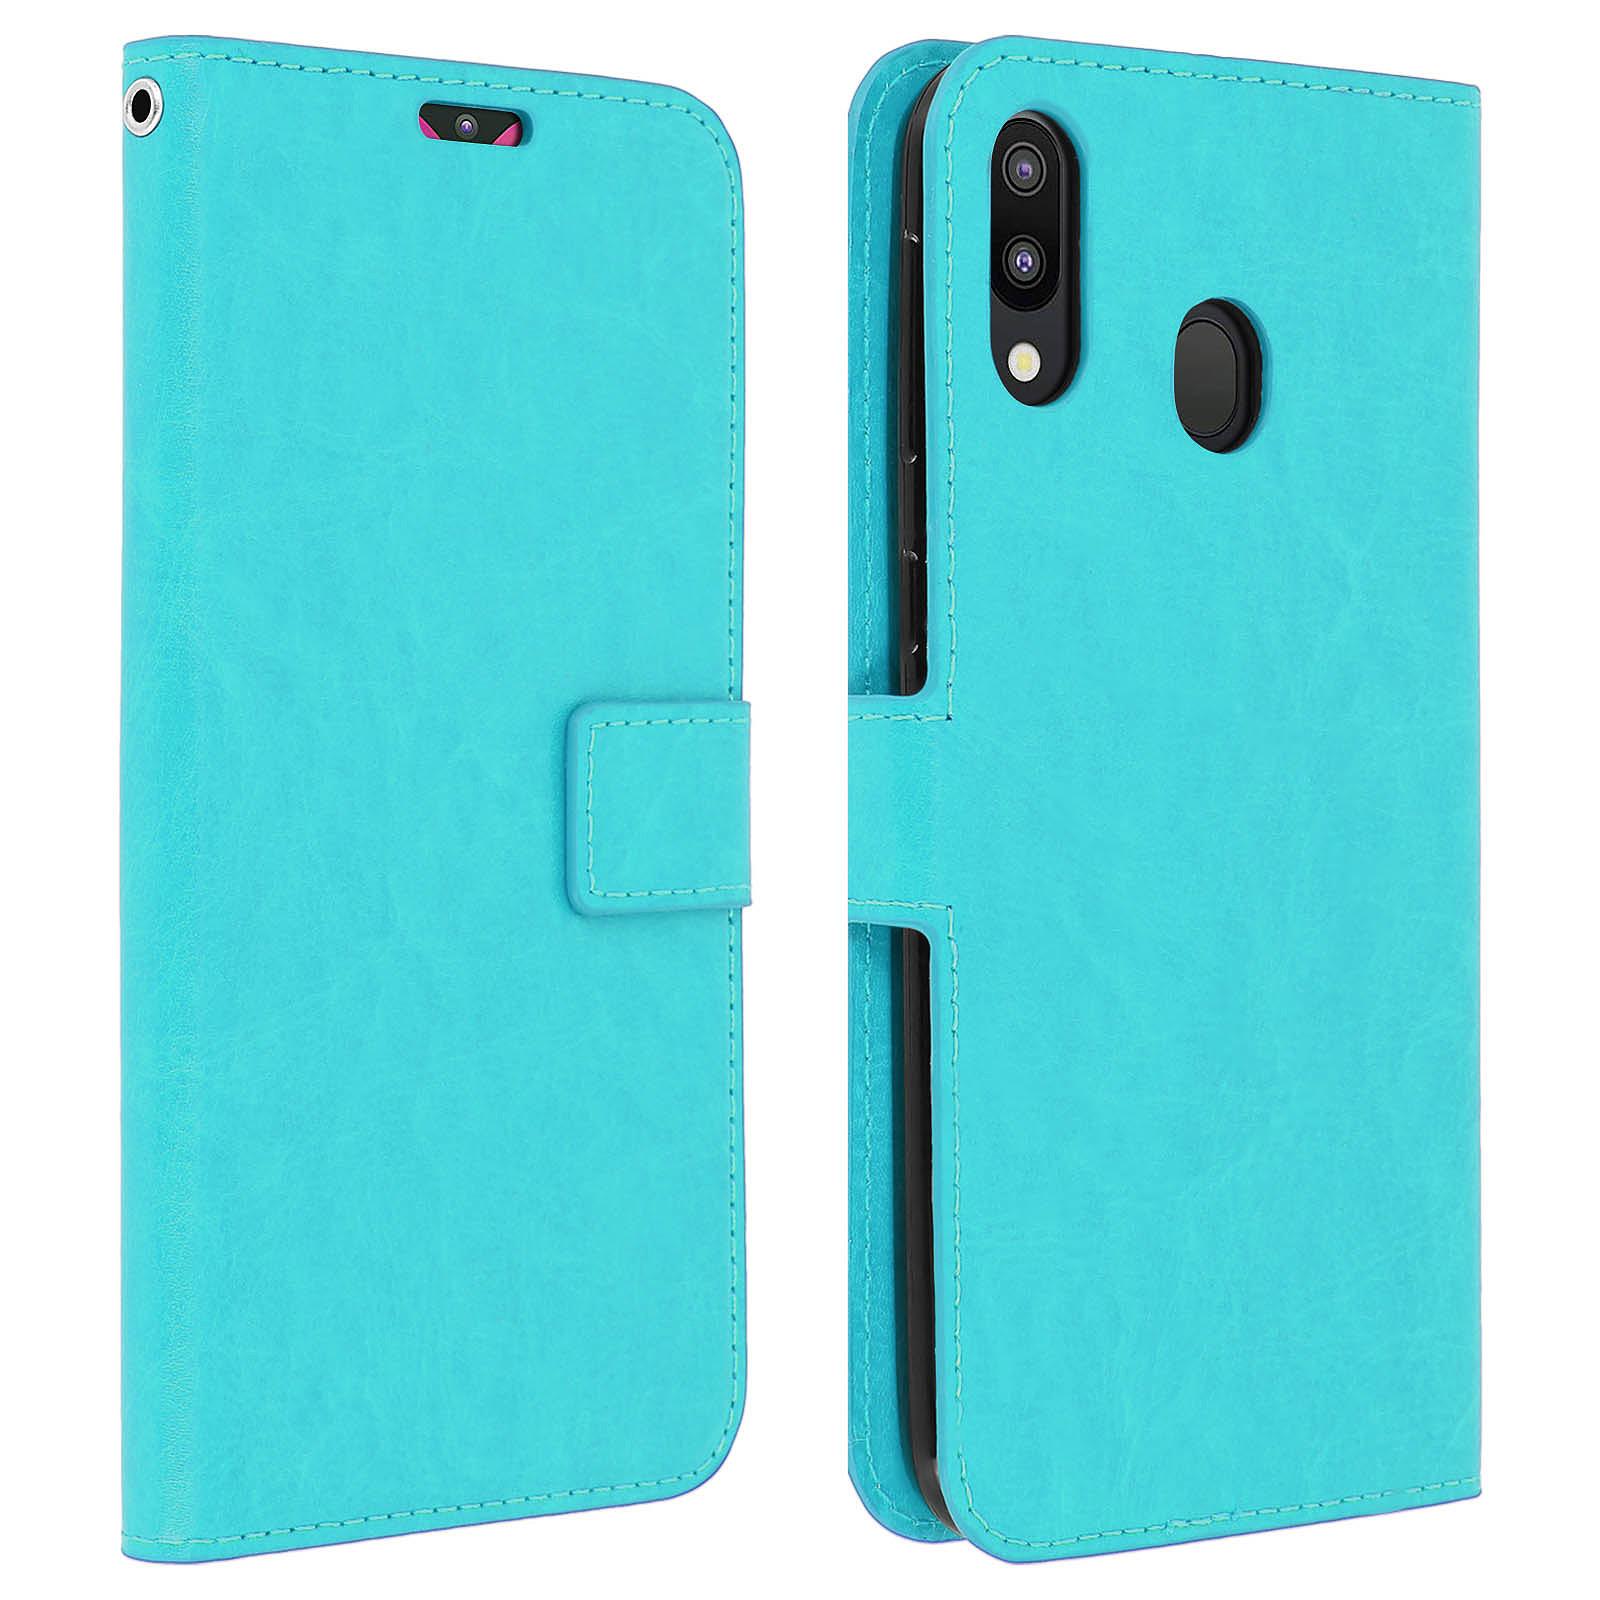 Avizar Etui folio Turquoise pour Samsung Galaxy M20